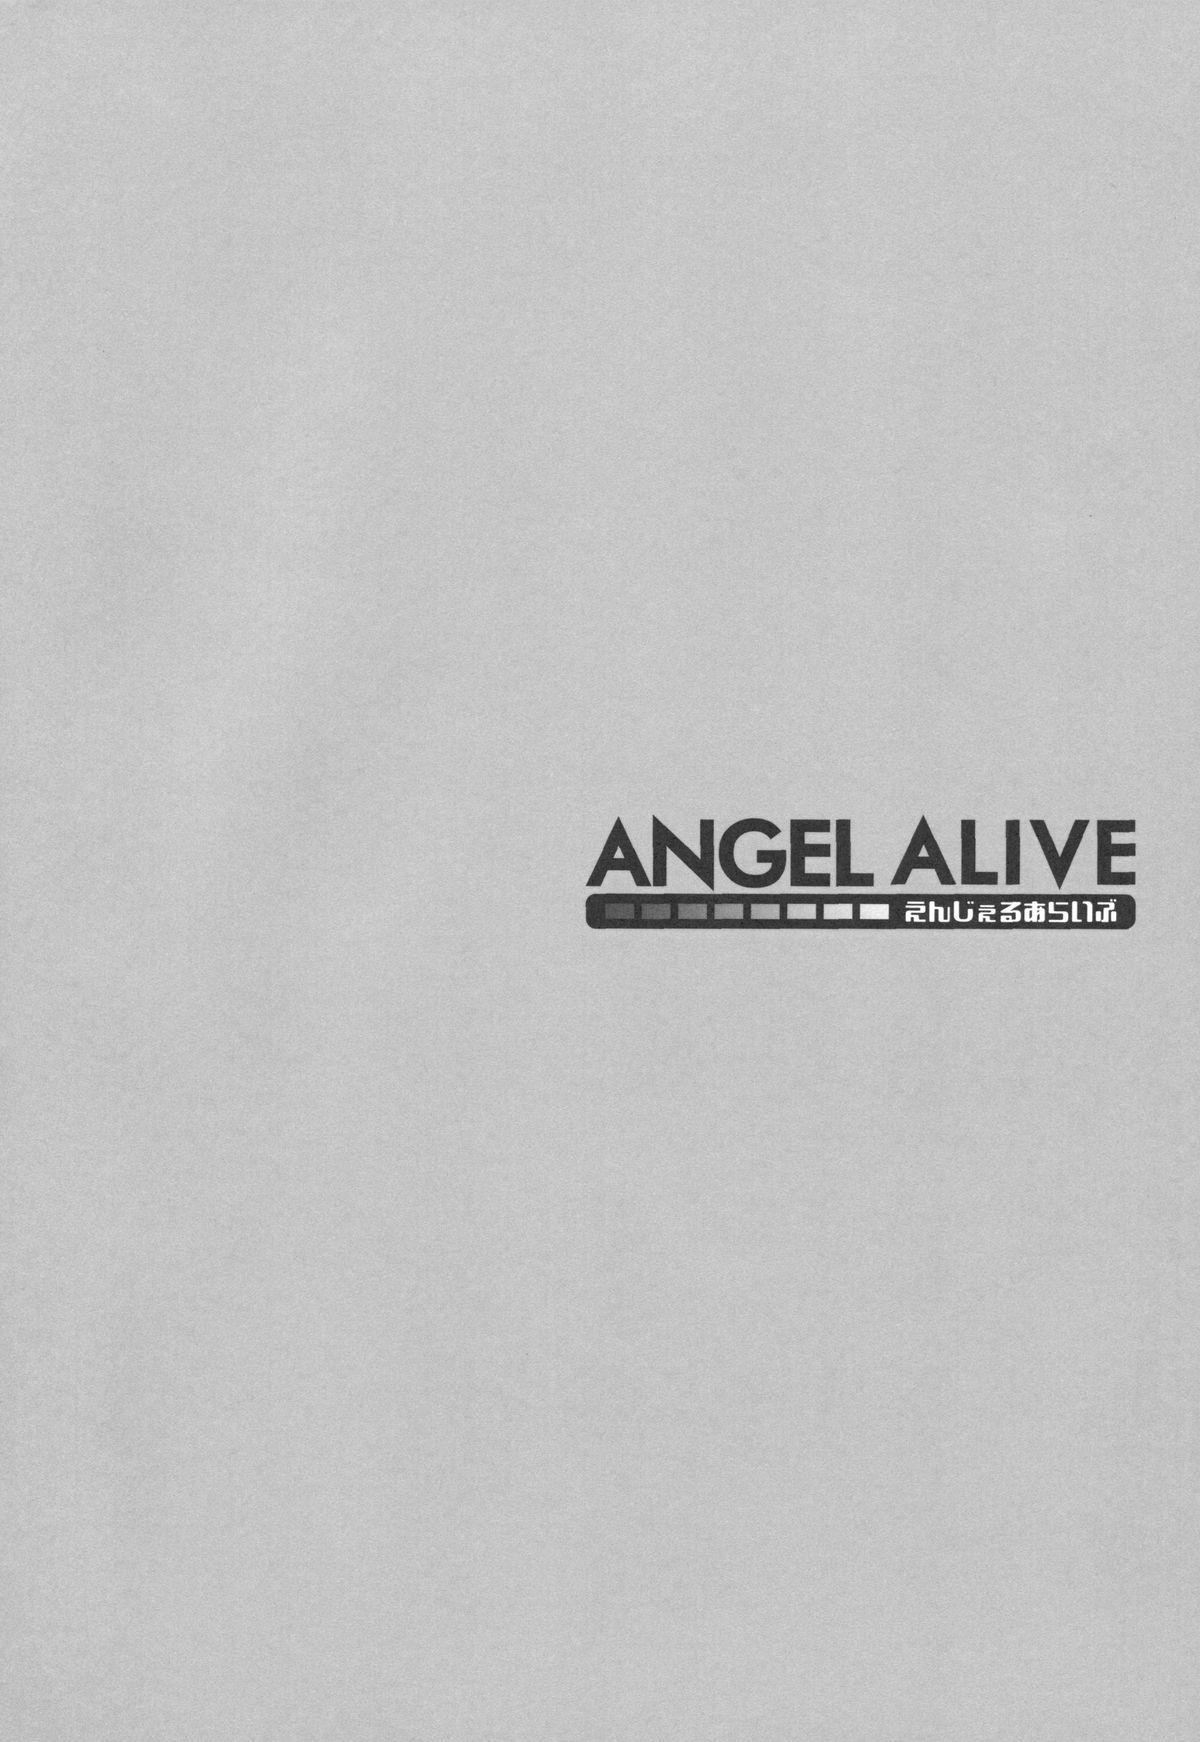 ANGEL ALIVE 2